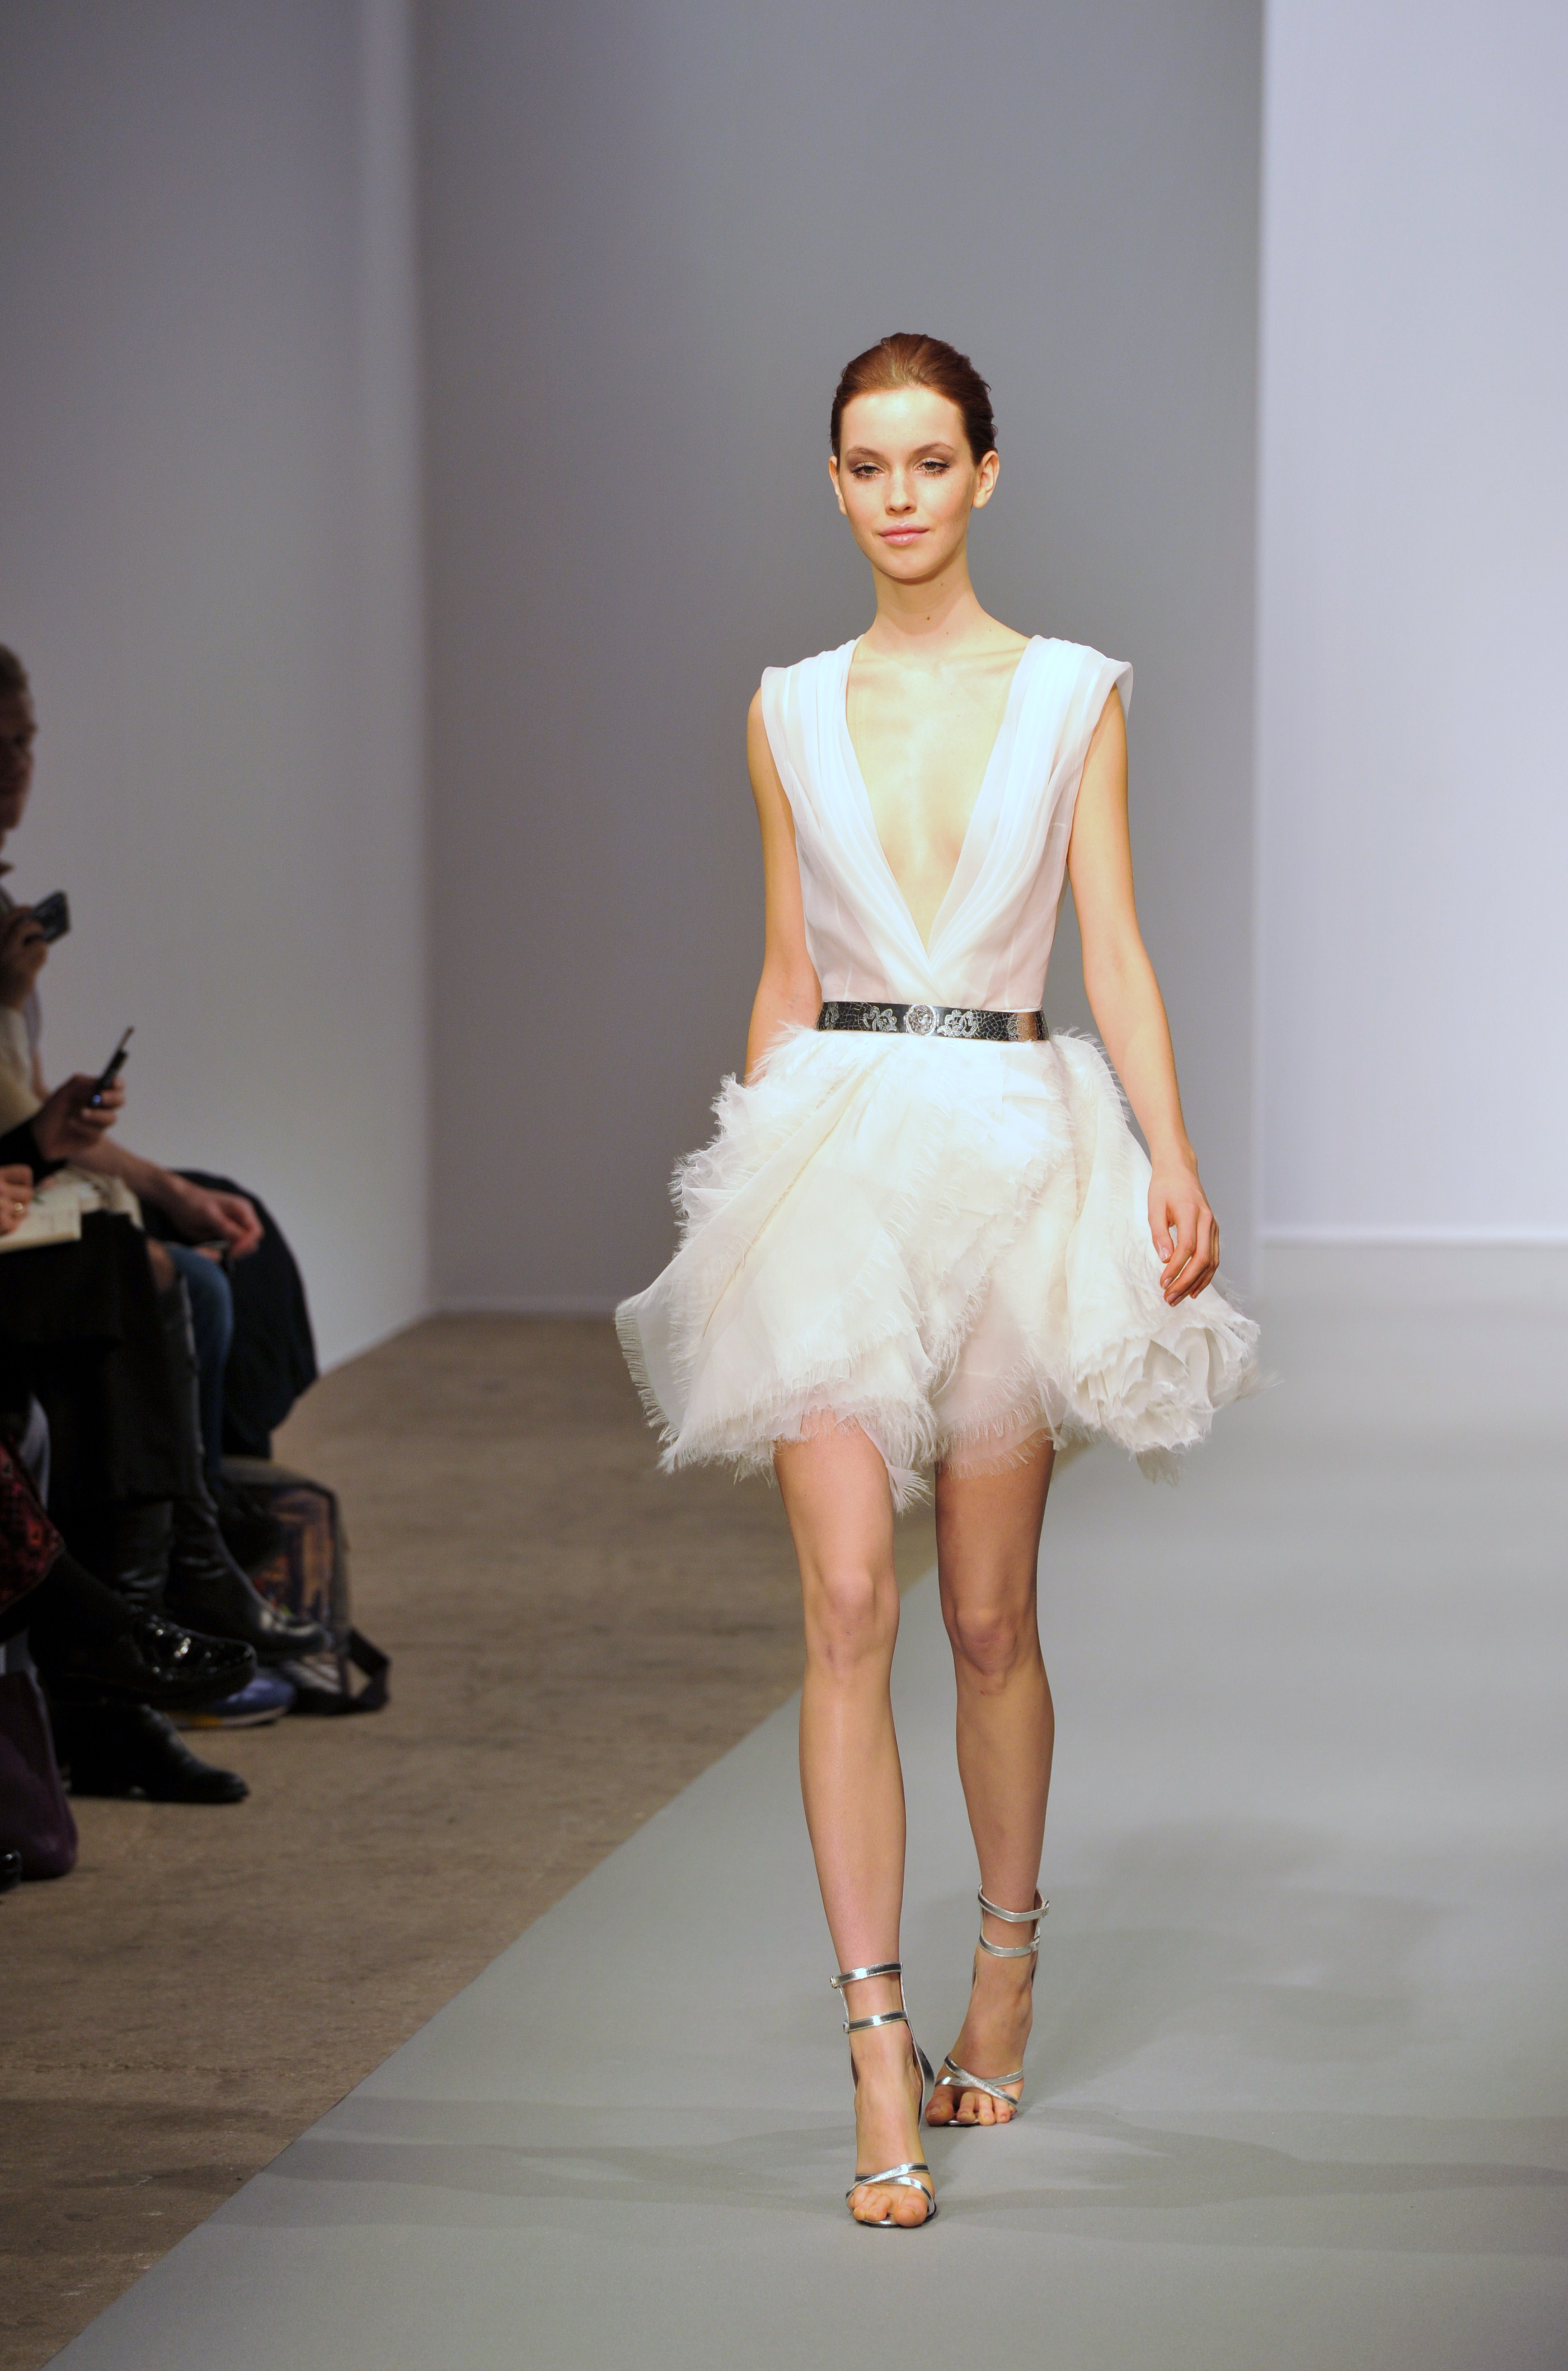 robes l gantes robes courtes haute couture. Black Bedroom Furniture Sets. Home Design Ideas